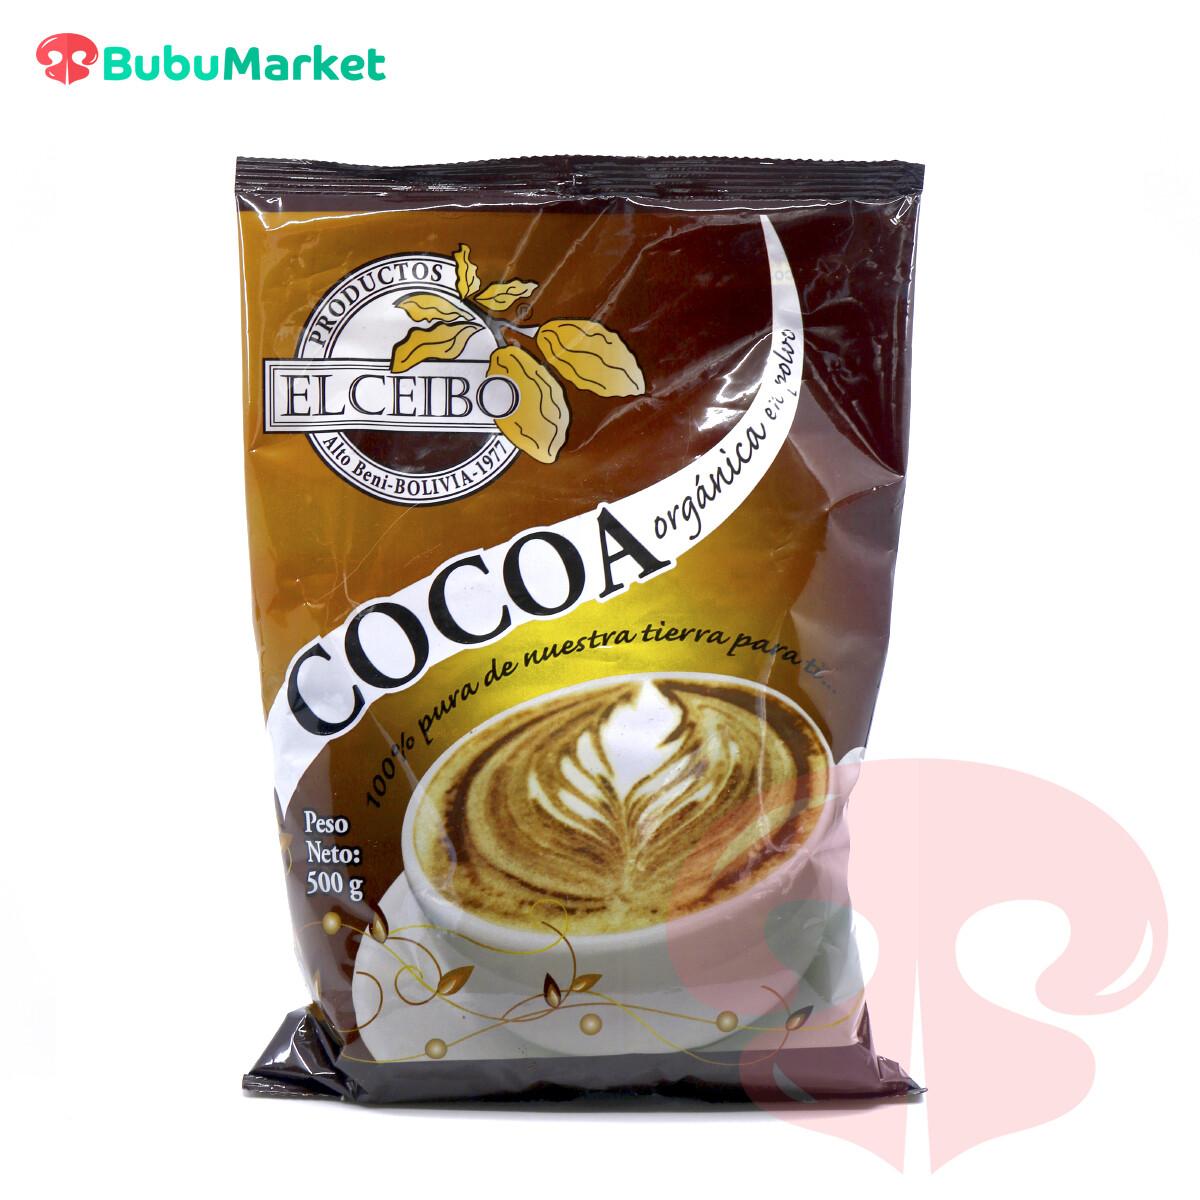 COCOA ORGANICA EL CEIBO BOLSA DE 500 GR.